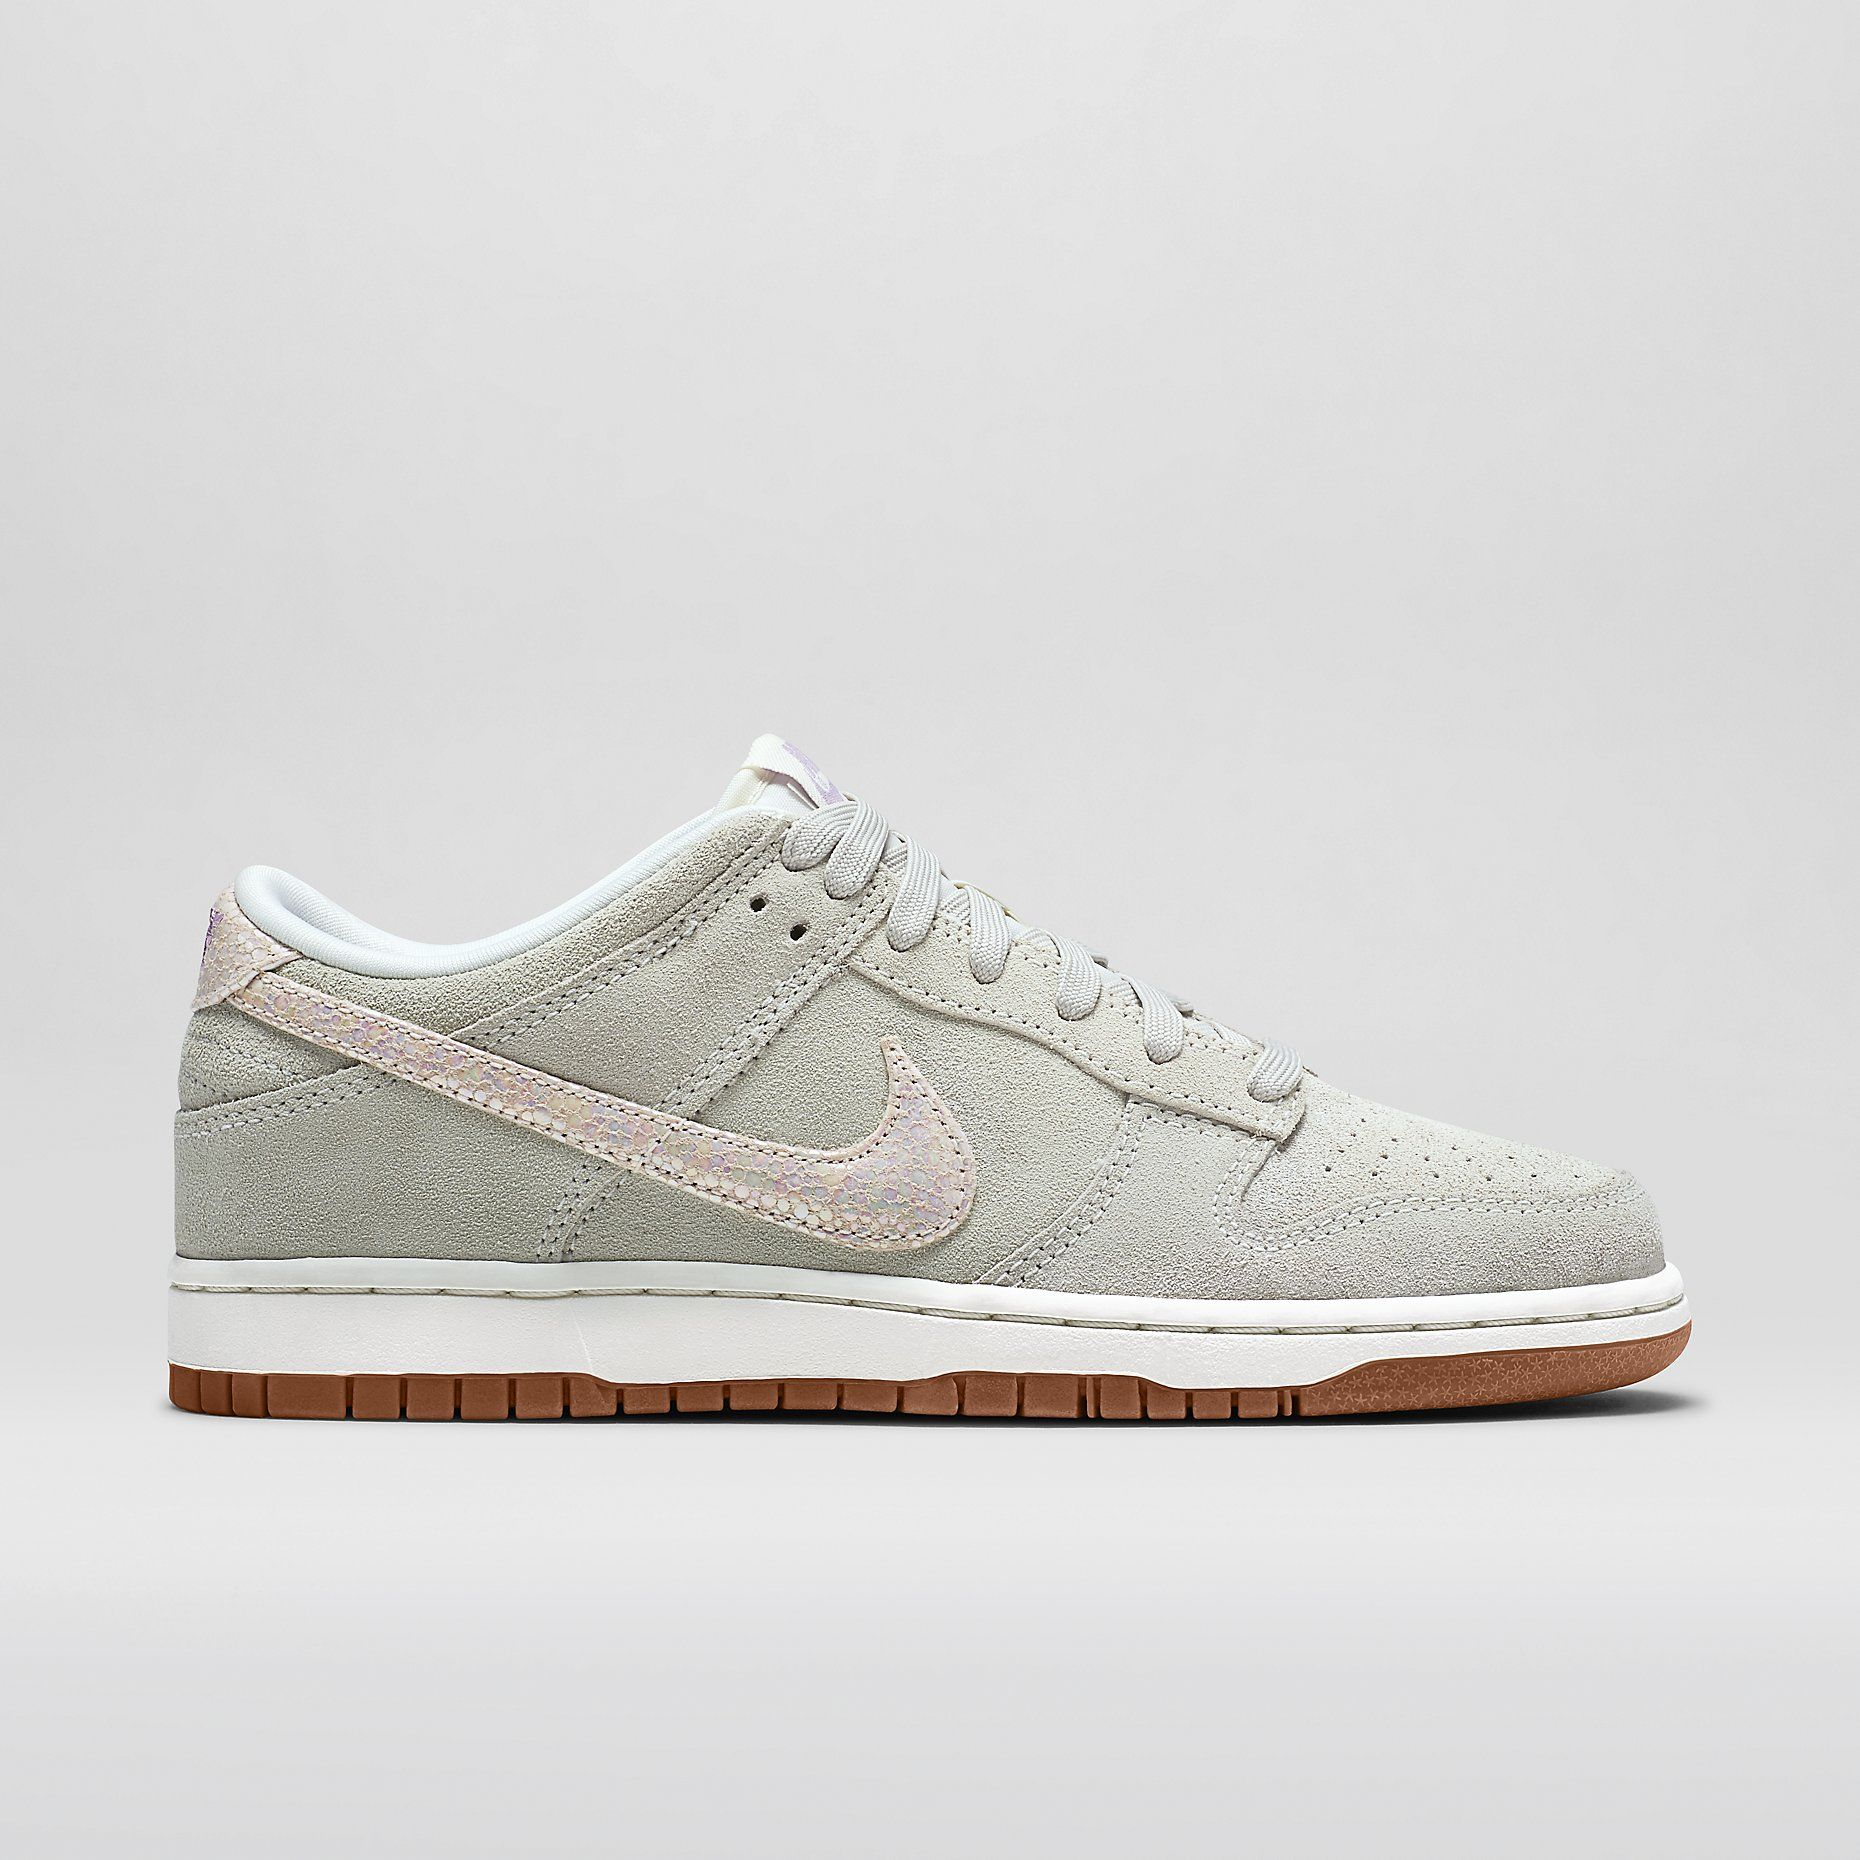 new concept 87eb9 dea35 Nike Dunk Low Skinny Premium Women s Shoe. Nike Store